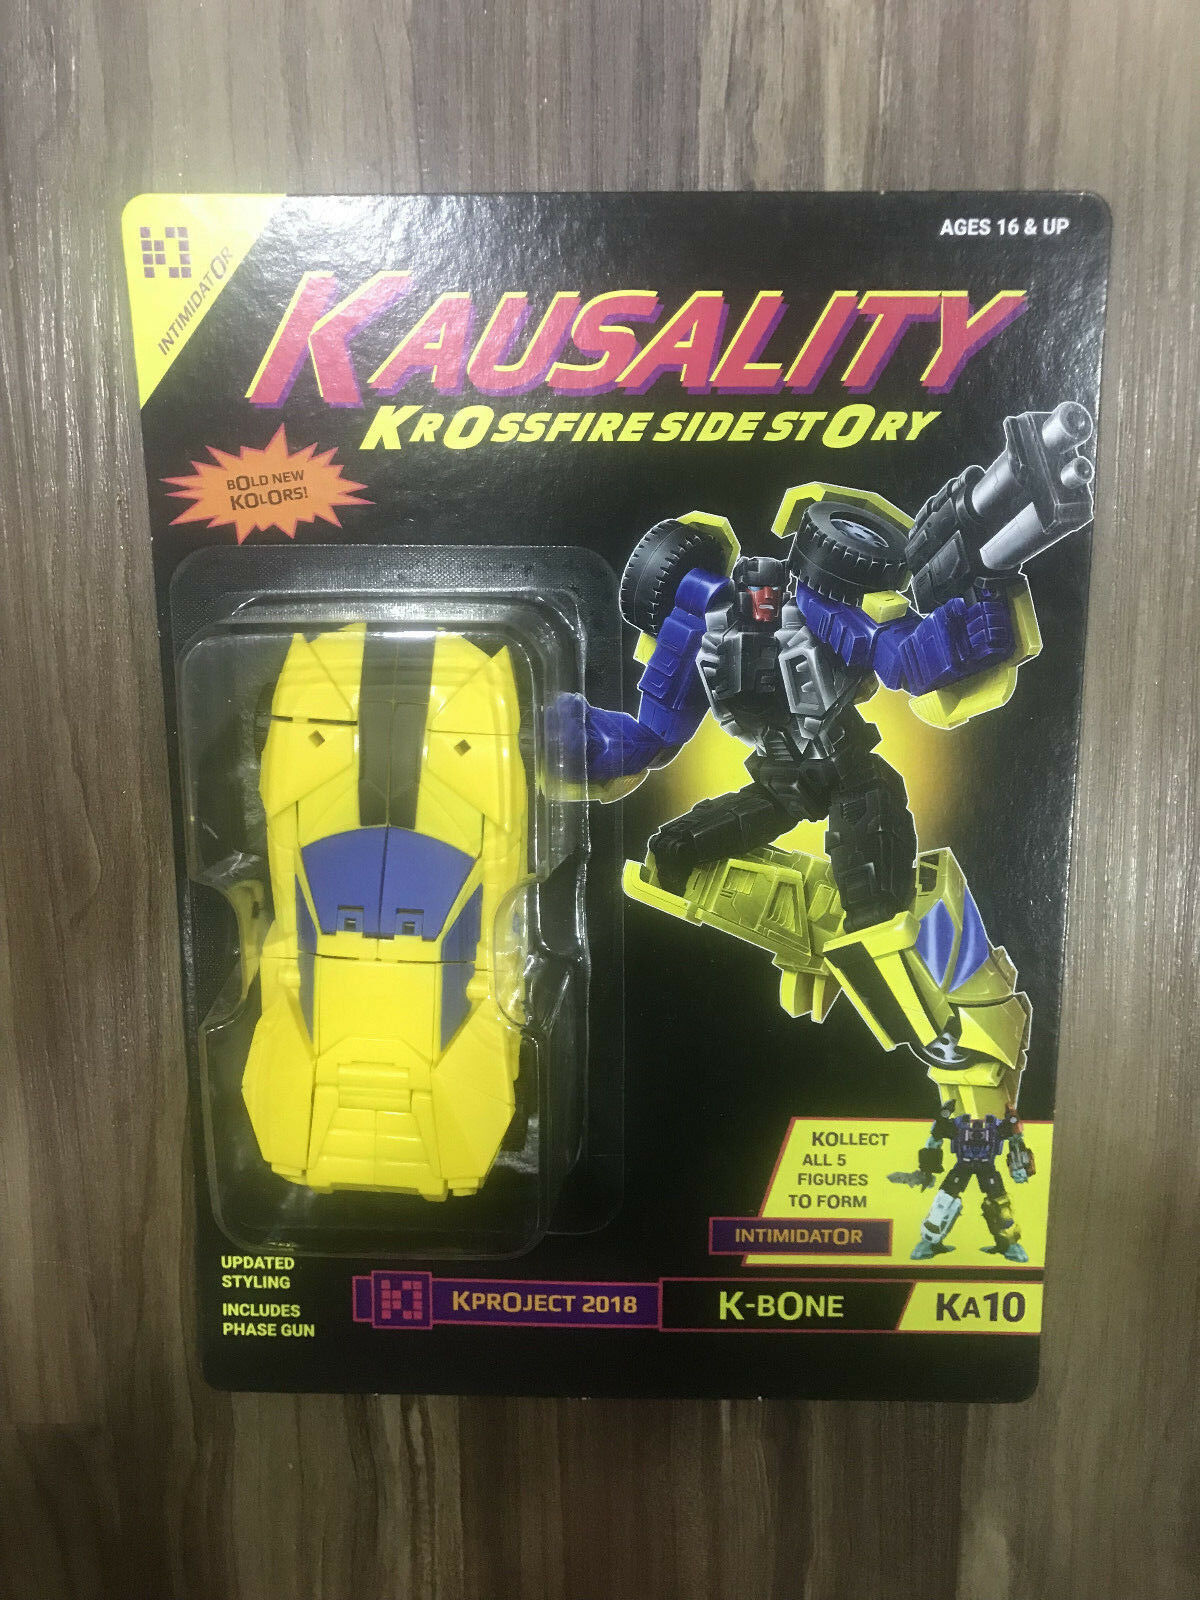 Transformers Transformers Transformers Fansproject Convention Kausality KA-10 K-Bone Menasor Breakdown 3aea8d